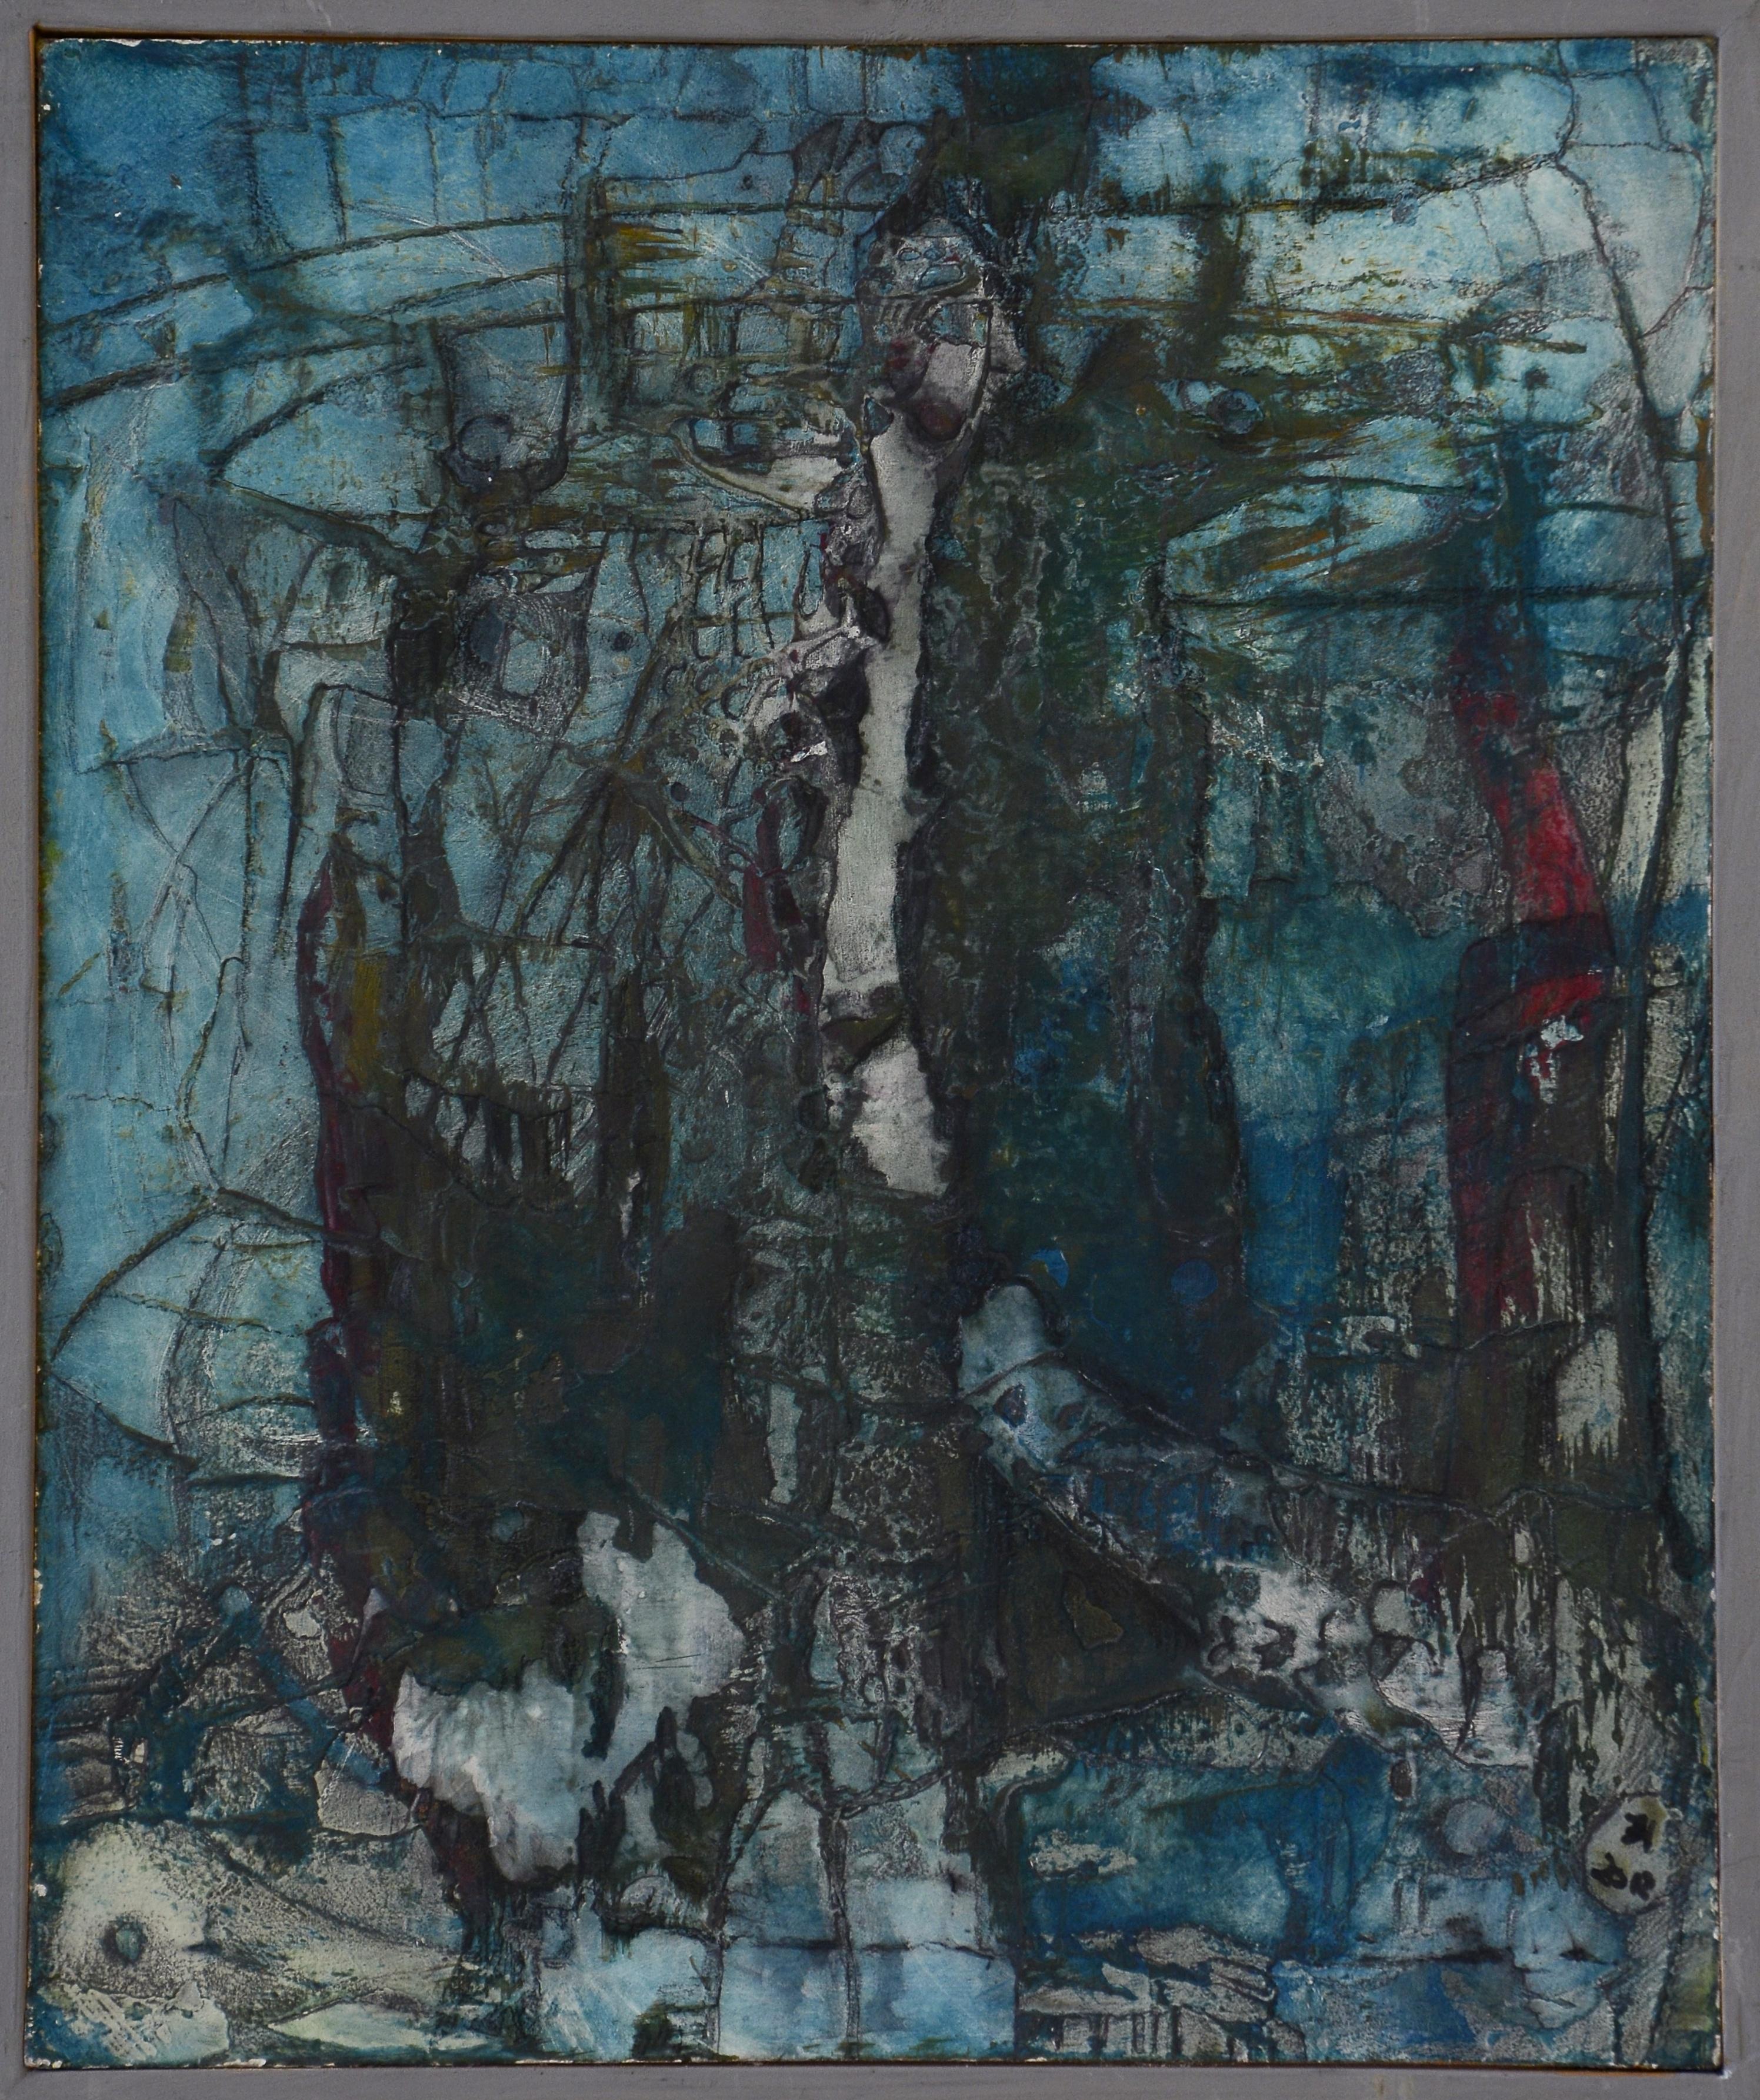 blaumann,acryl,tusche auf MDF,25x30cm,2012.JPG